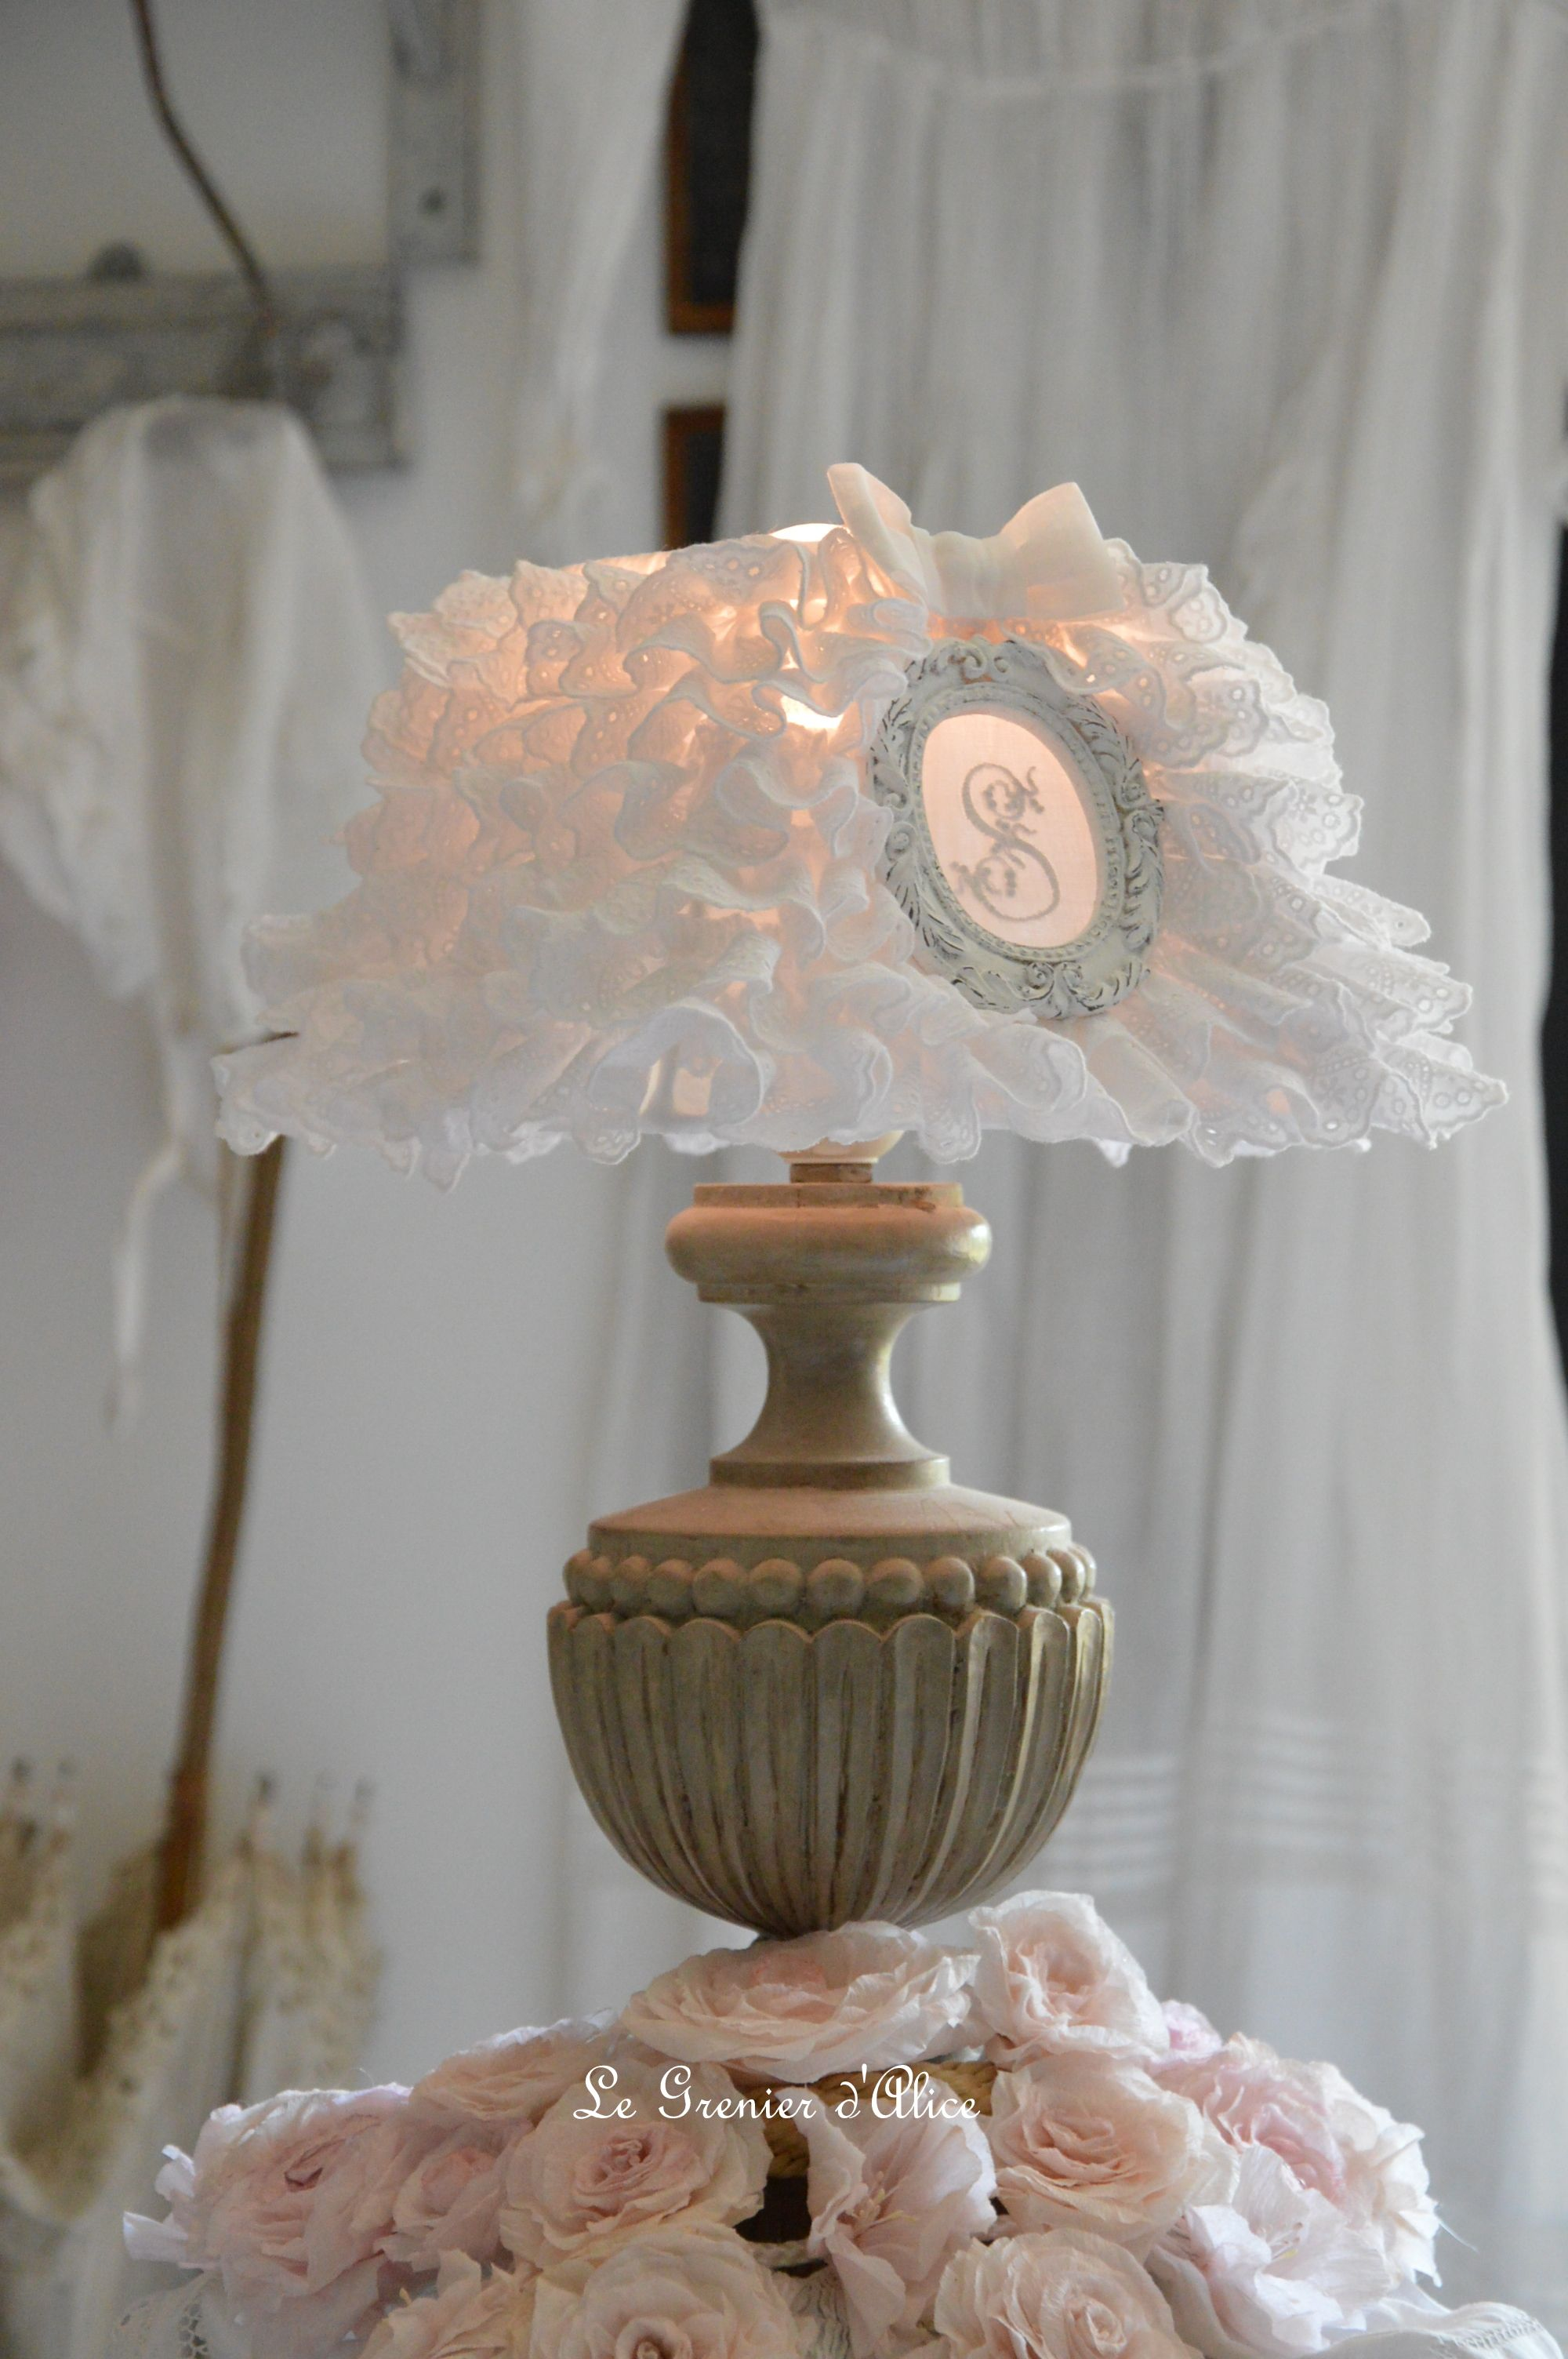 abat jour froufrou shabby chic et romantique broderie anglaise monogramme ornement patin blanc. Black Bedroom Furniture Sets. Home Design Ideas